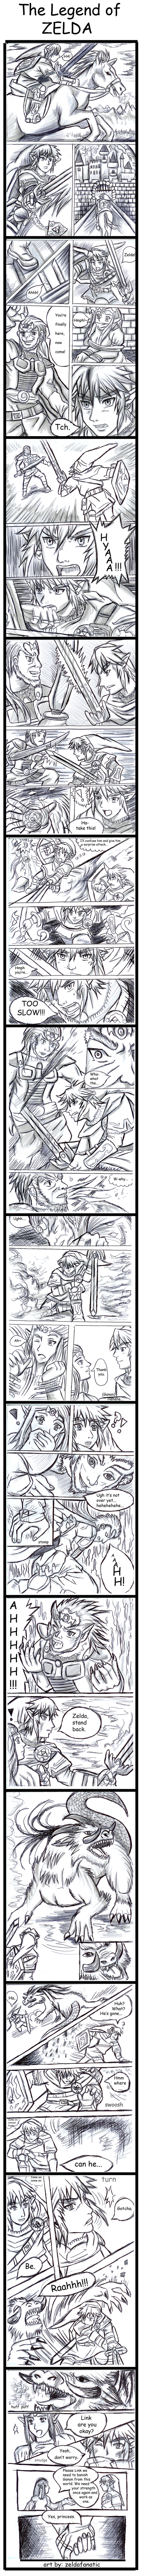 Extra Zelda Bonus Comic by Rinkuchan